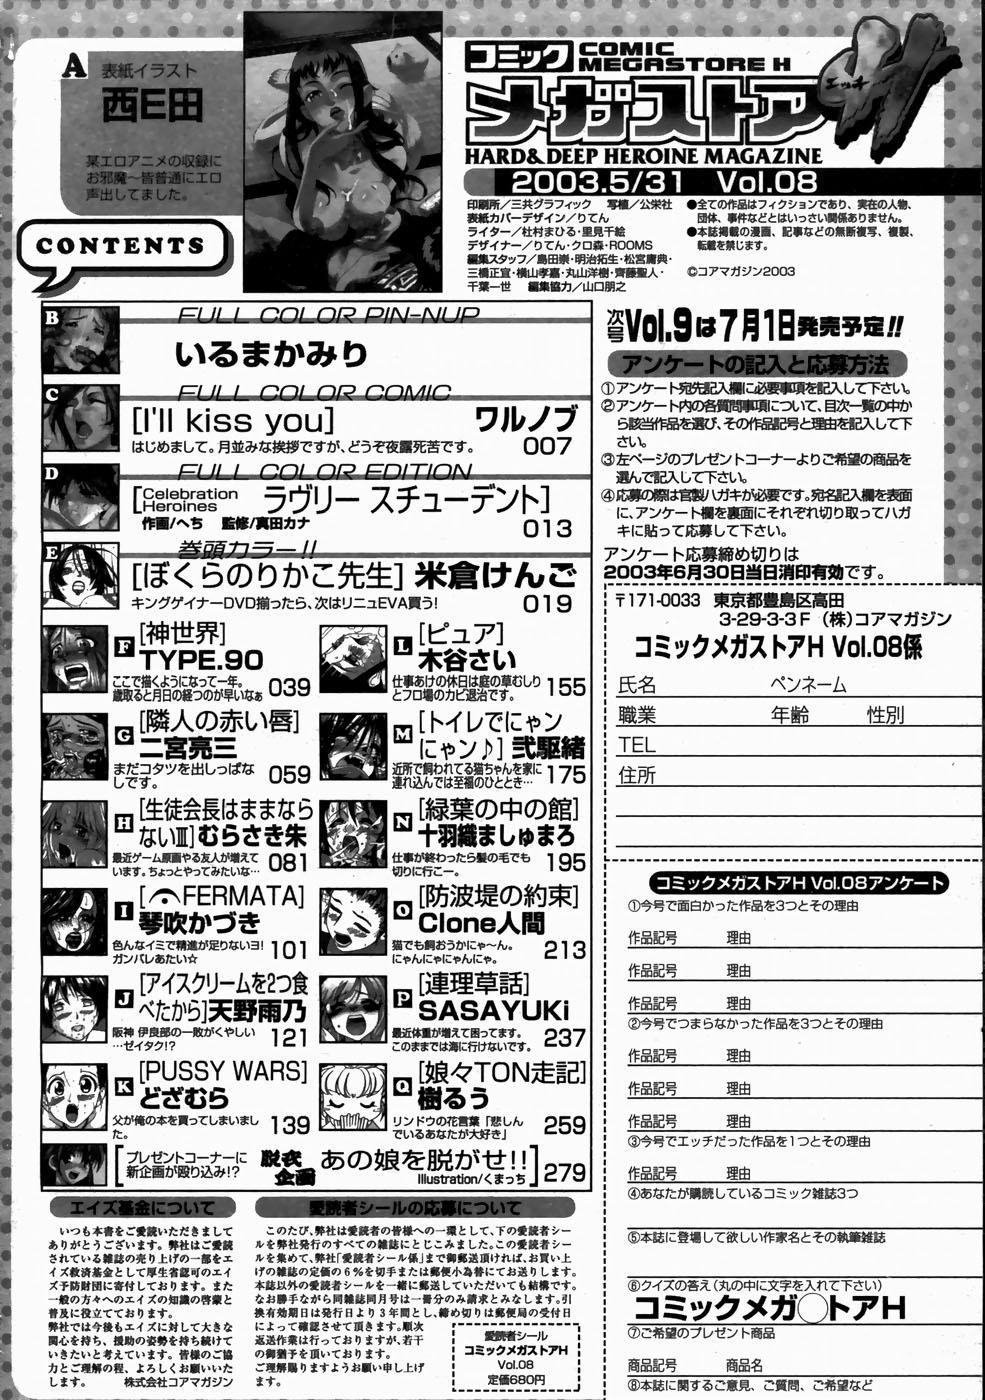 COMIC Megastore H 2003-07 275